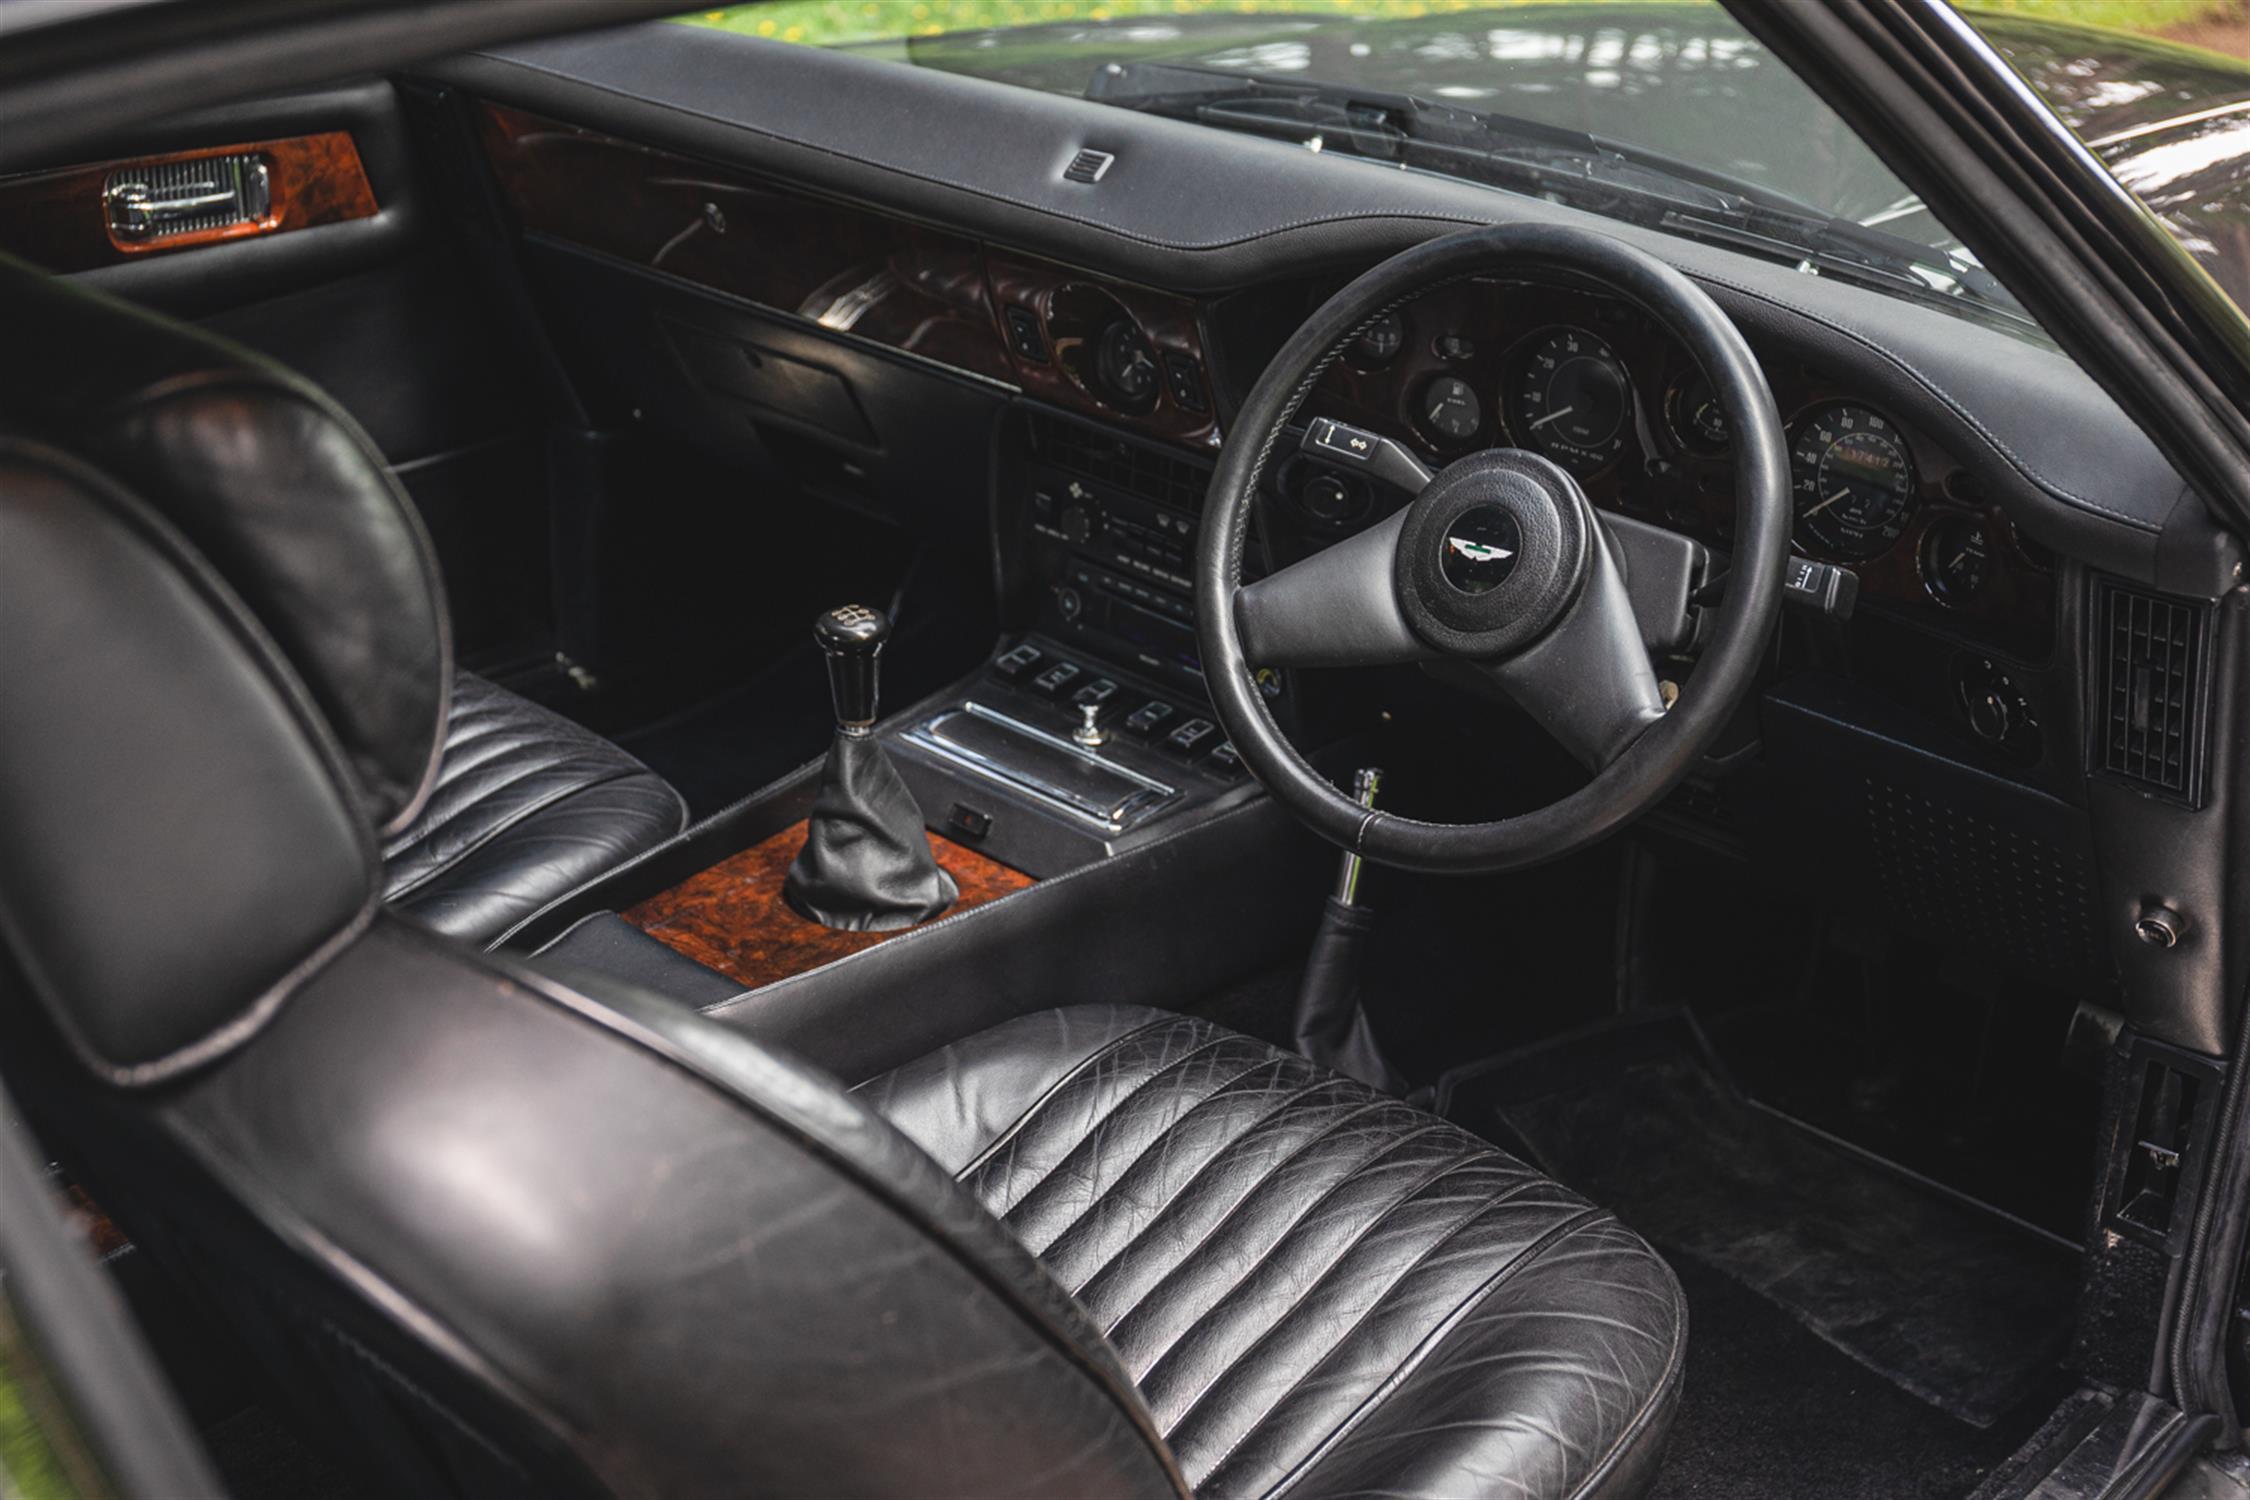 1990 Aston Martin V8 Vantage Coupe X-Pack (Manual) - Image 3 of 10